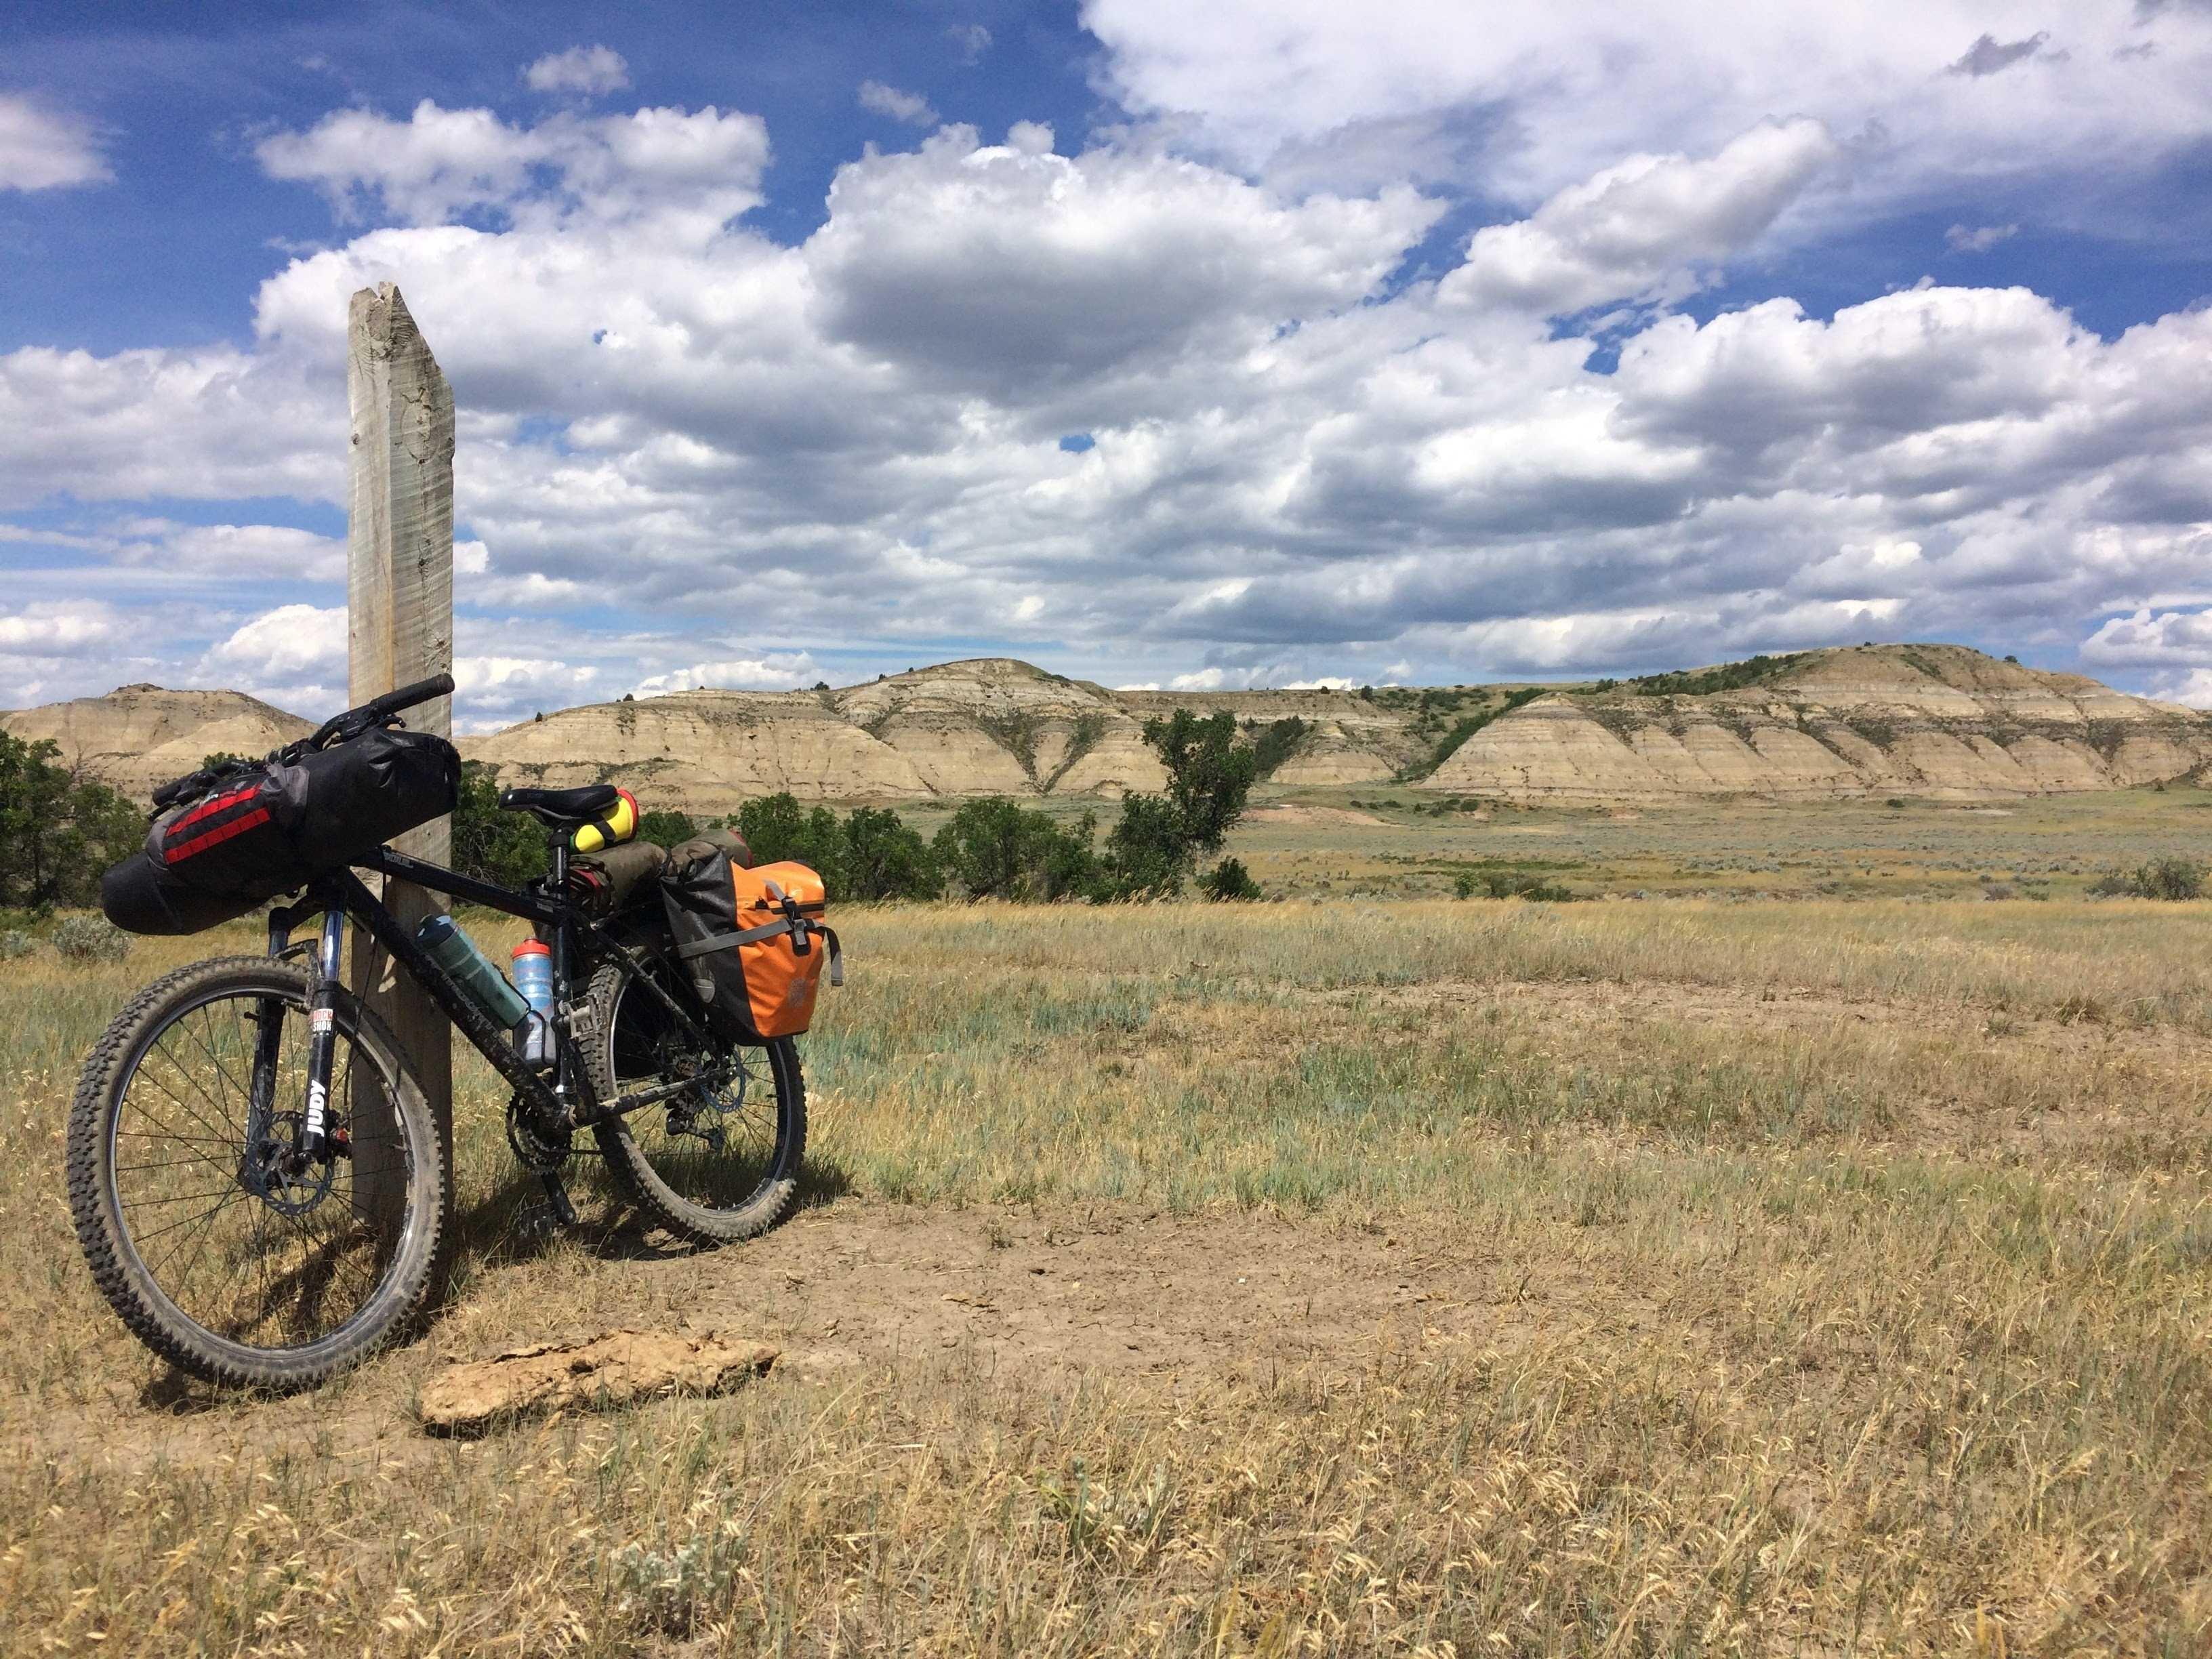 Legendary Biking on North Dakota's Maah Daah Hey Trail